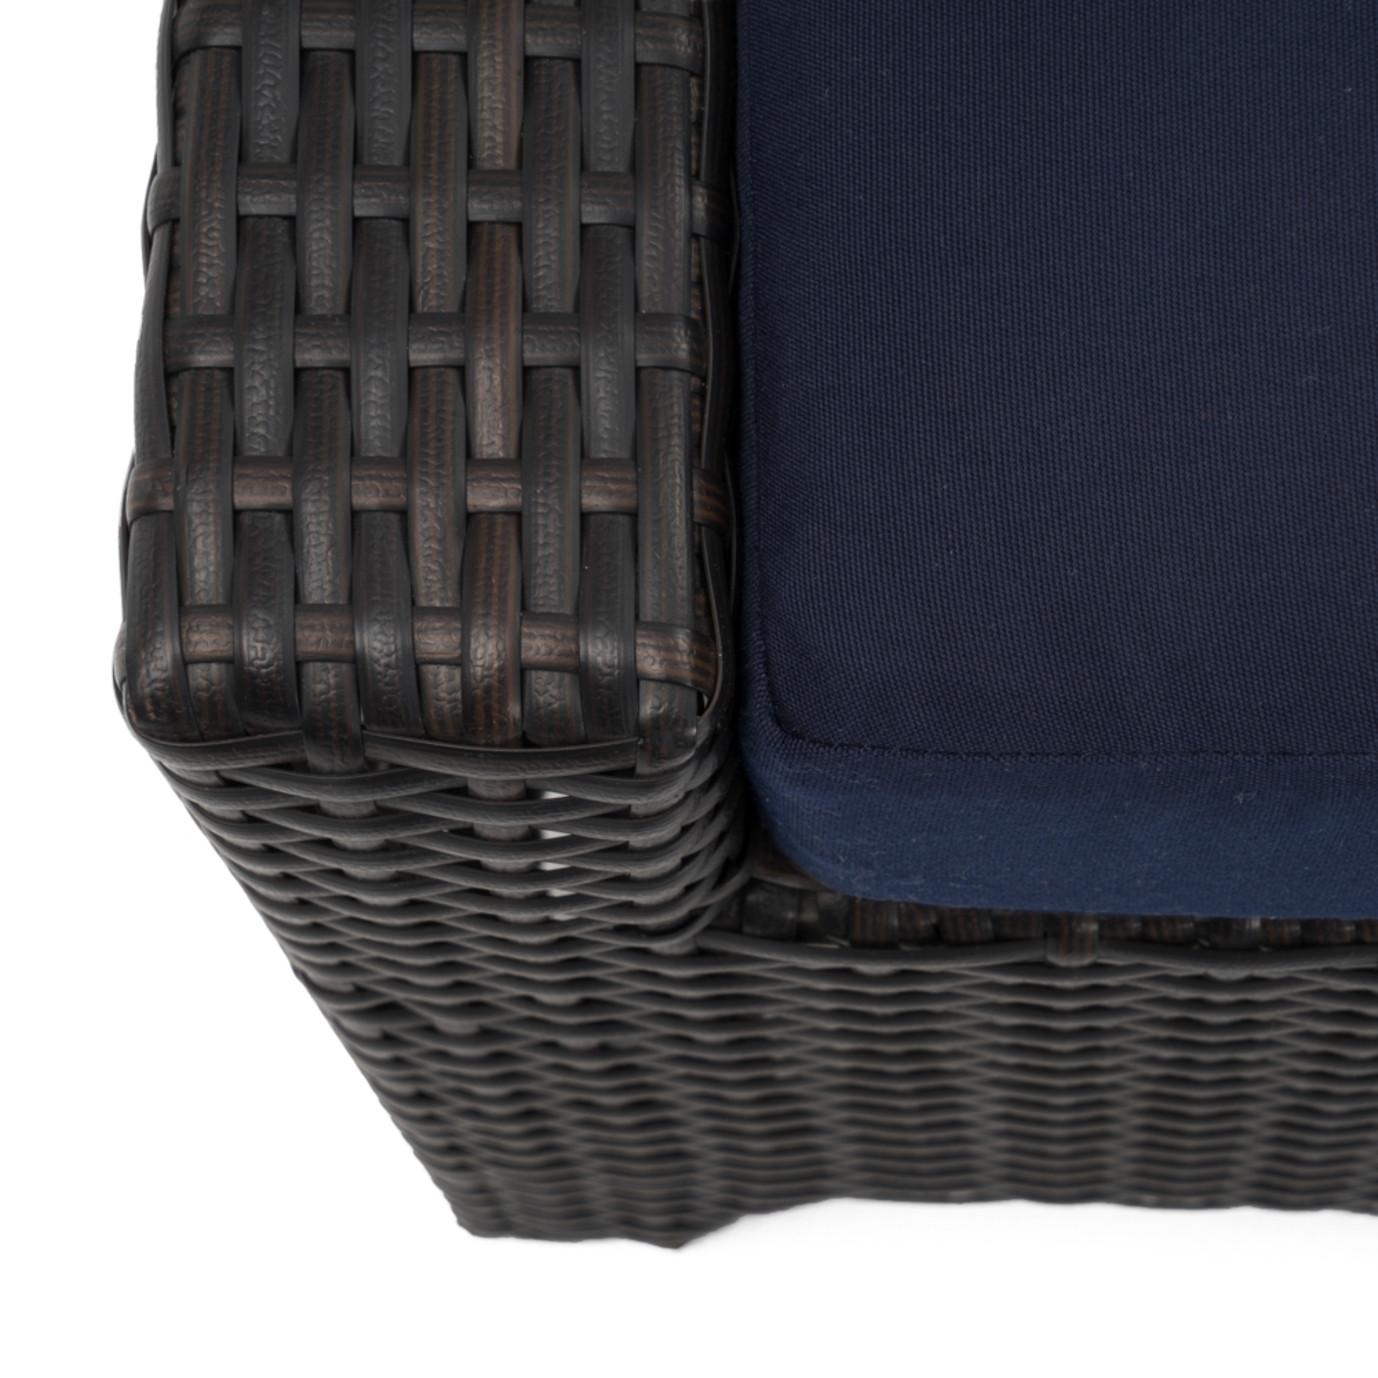 Deco™ 8pc Sofa and Club Chair Set - Navy Blue